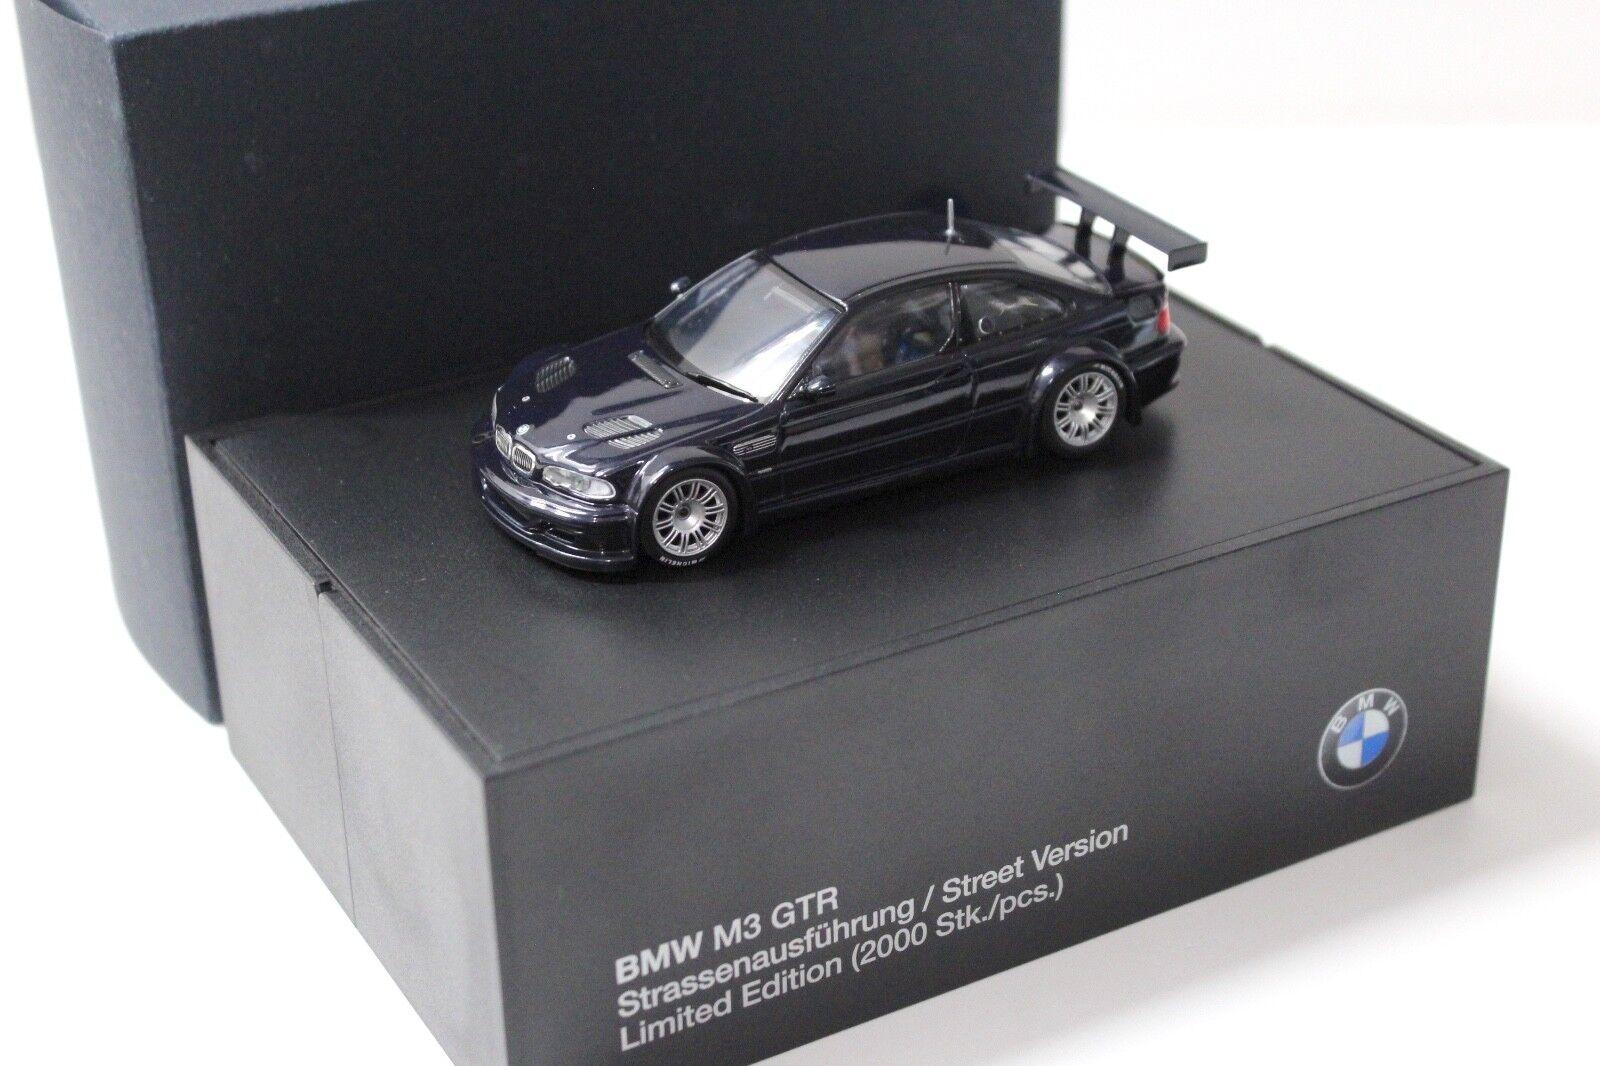 1 43 Minichamps bmw m3 GTR e46 Street negro dealer New en Premium-modelcars